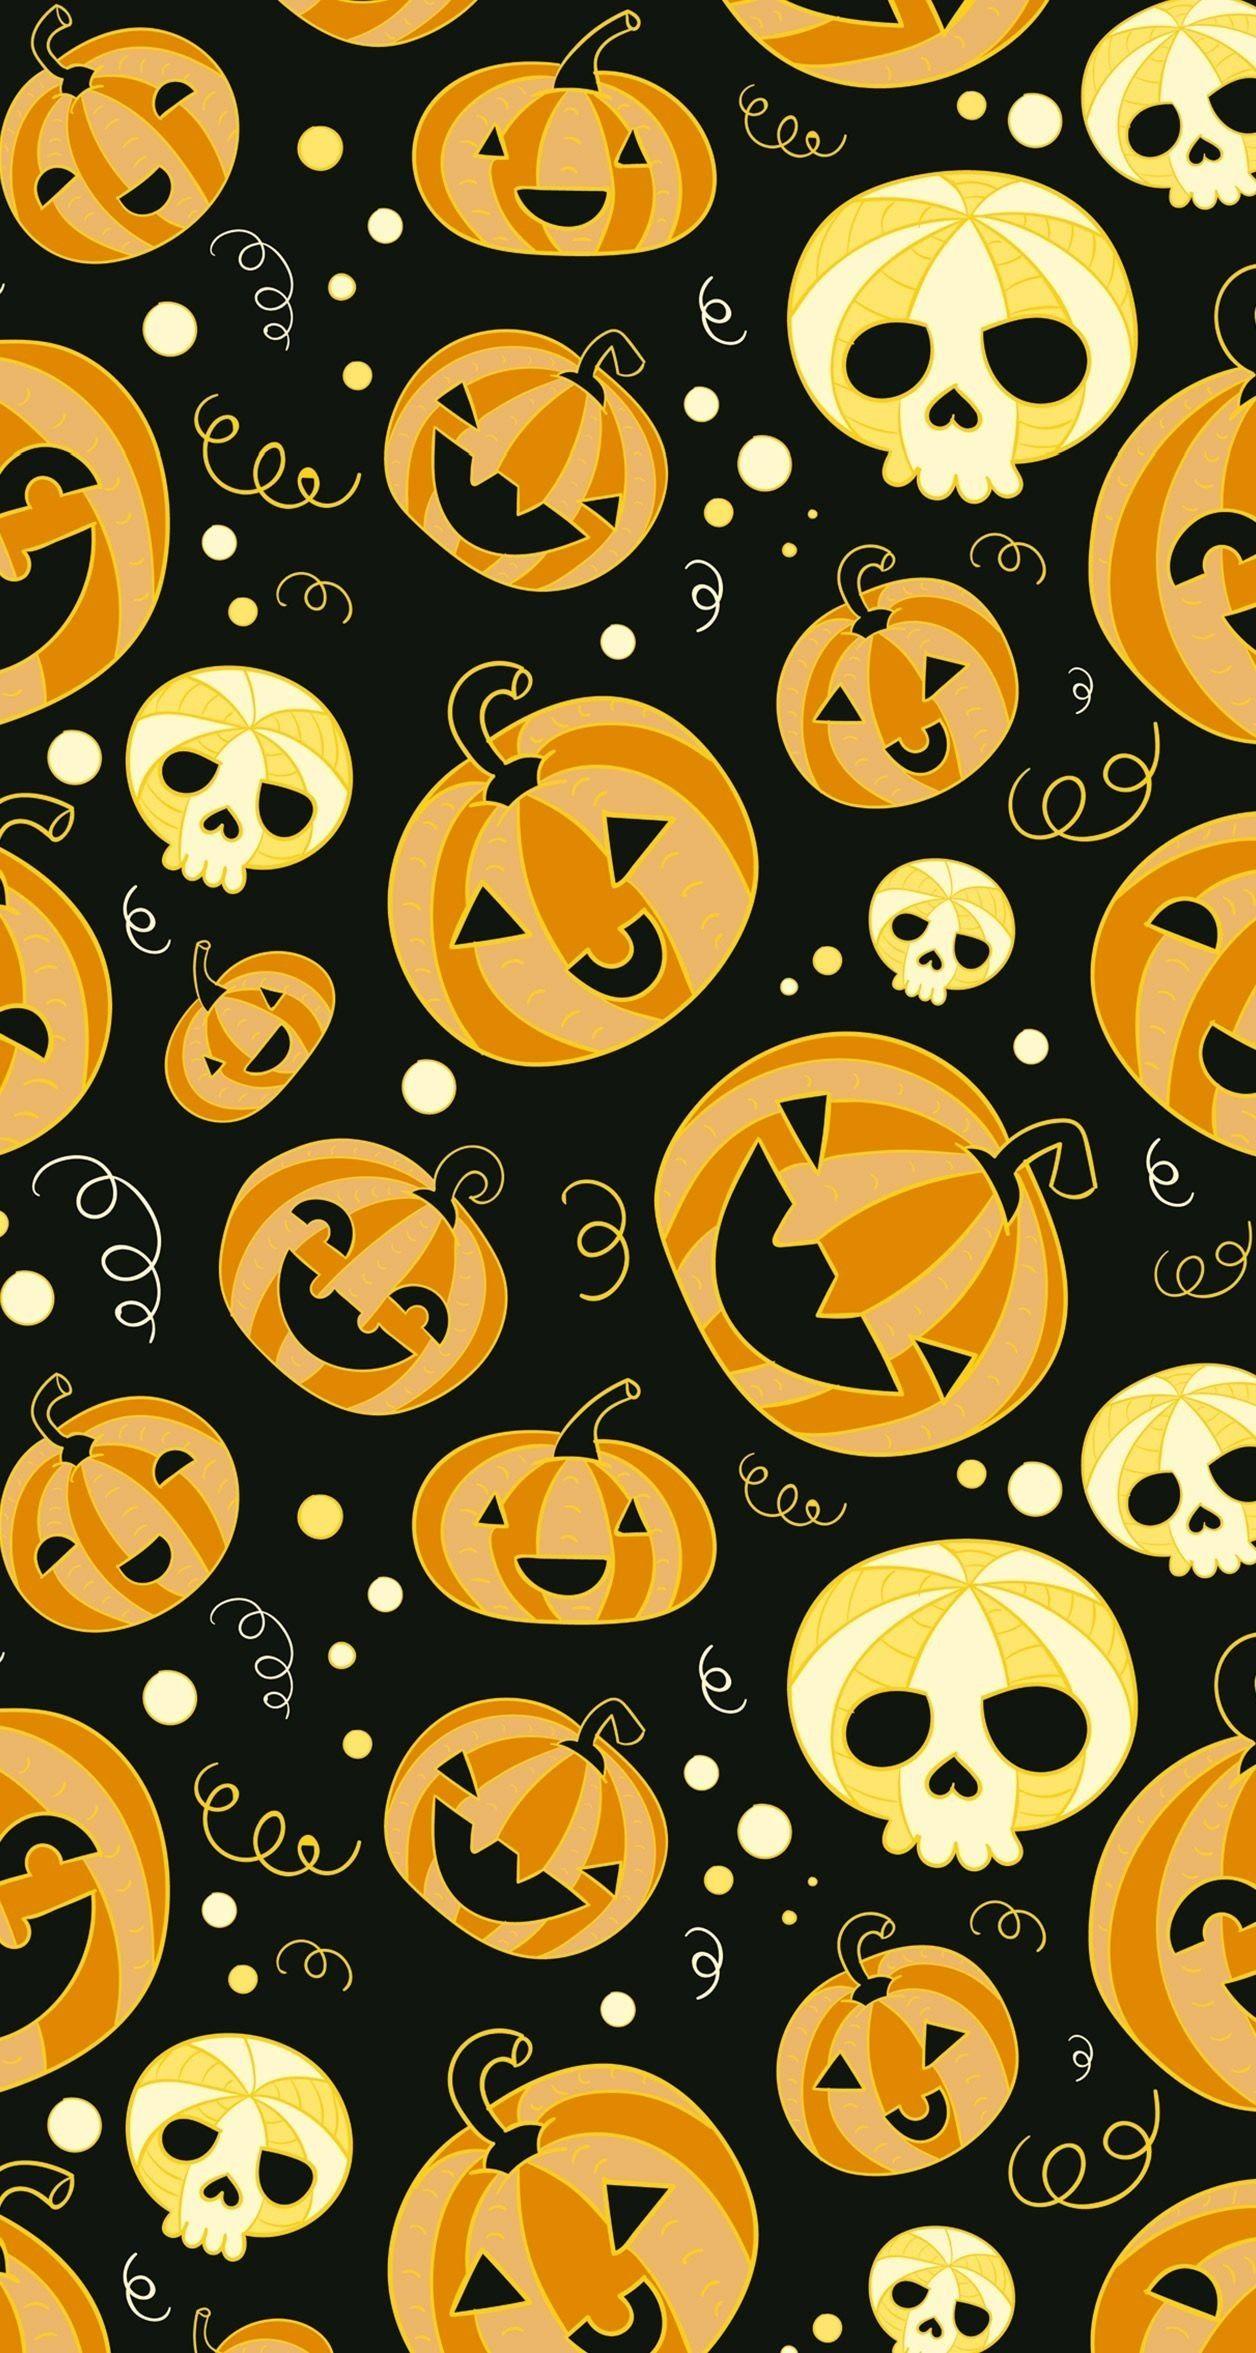 Free Download Cute Halloween Iphone Wallpapers Top Cute